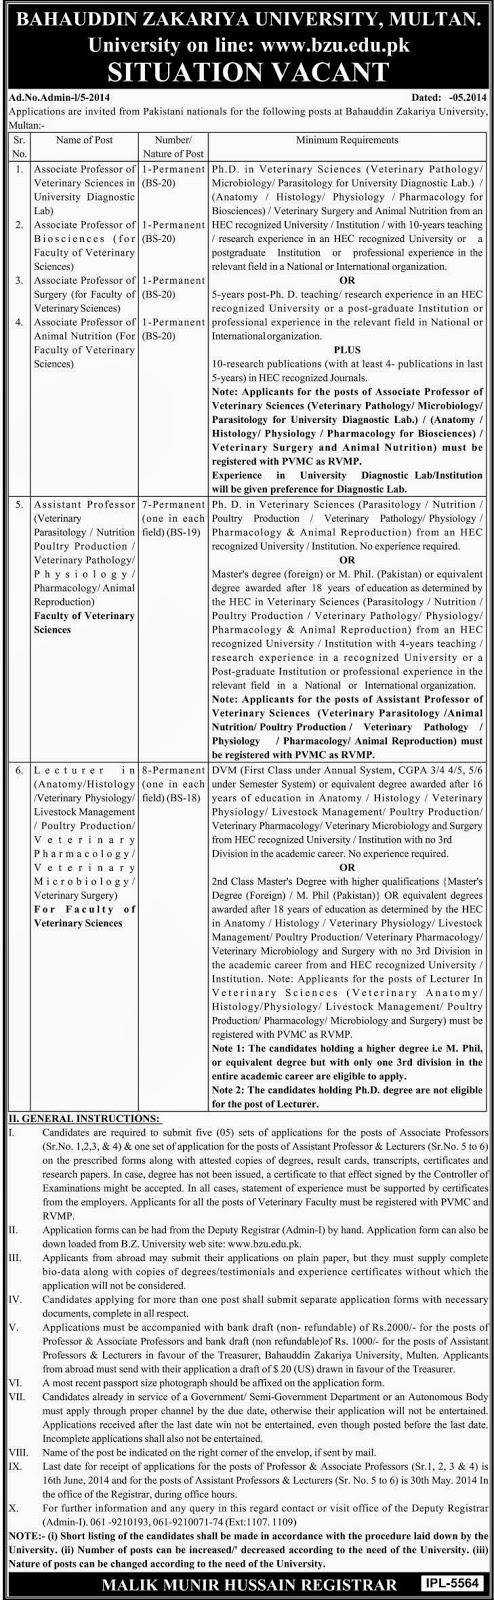 Professor and Lecturer Jobs in Bahauddin Zakariya University, Multan